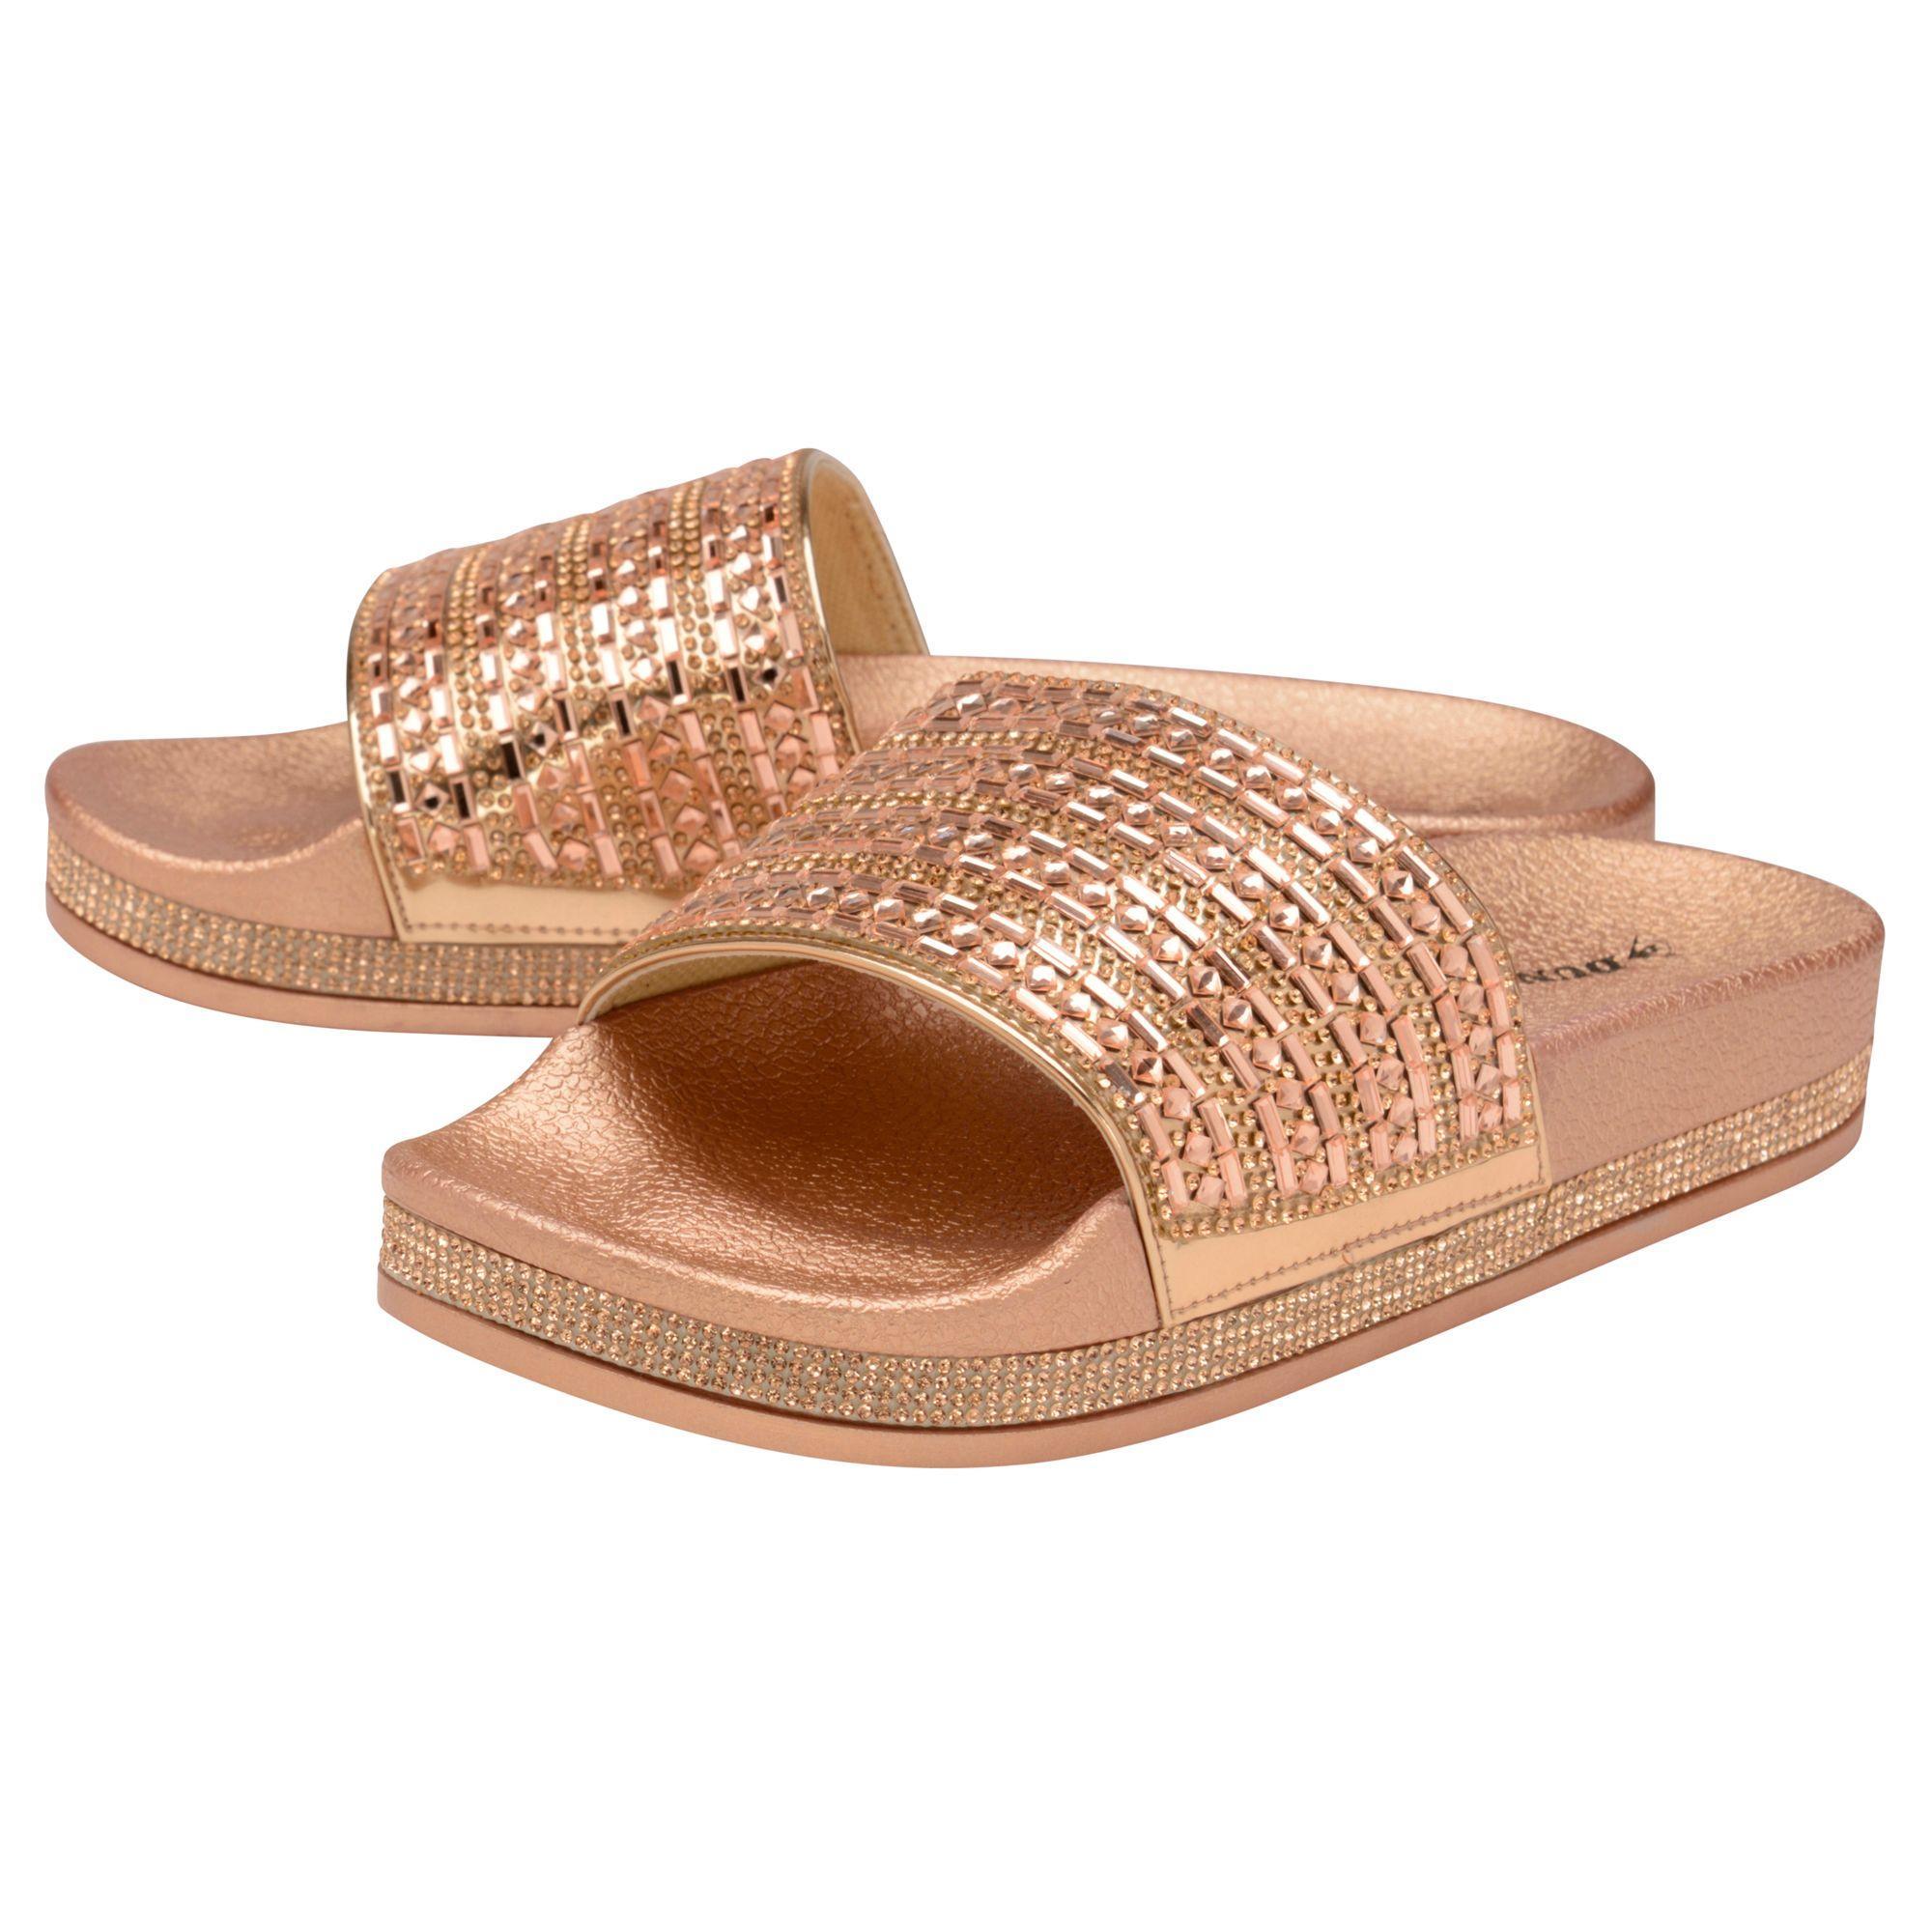 61f5fcf74b7c Dunlop - Pink Rose Gold  emmie  Mule Sandals - Lyst. View fullscreen